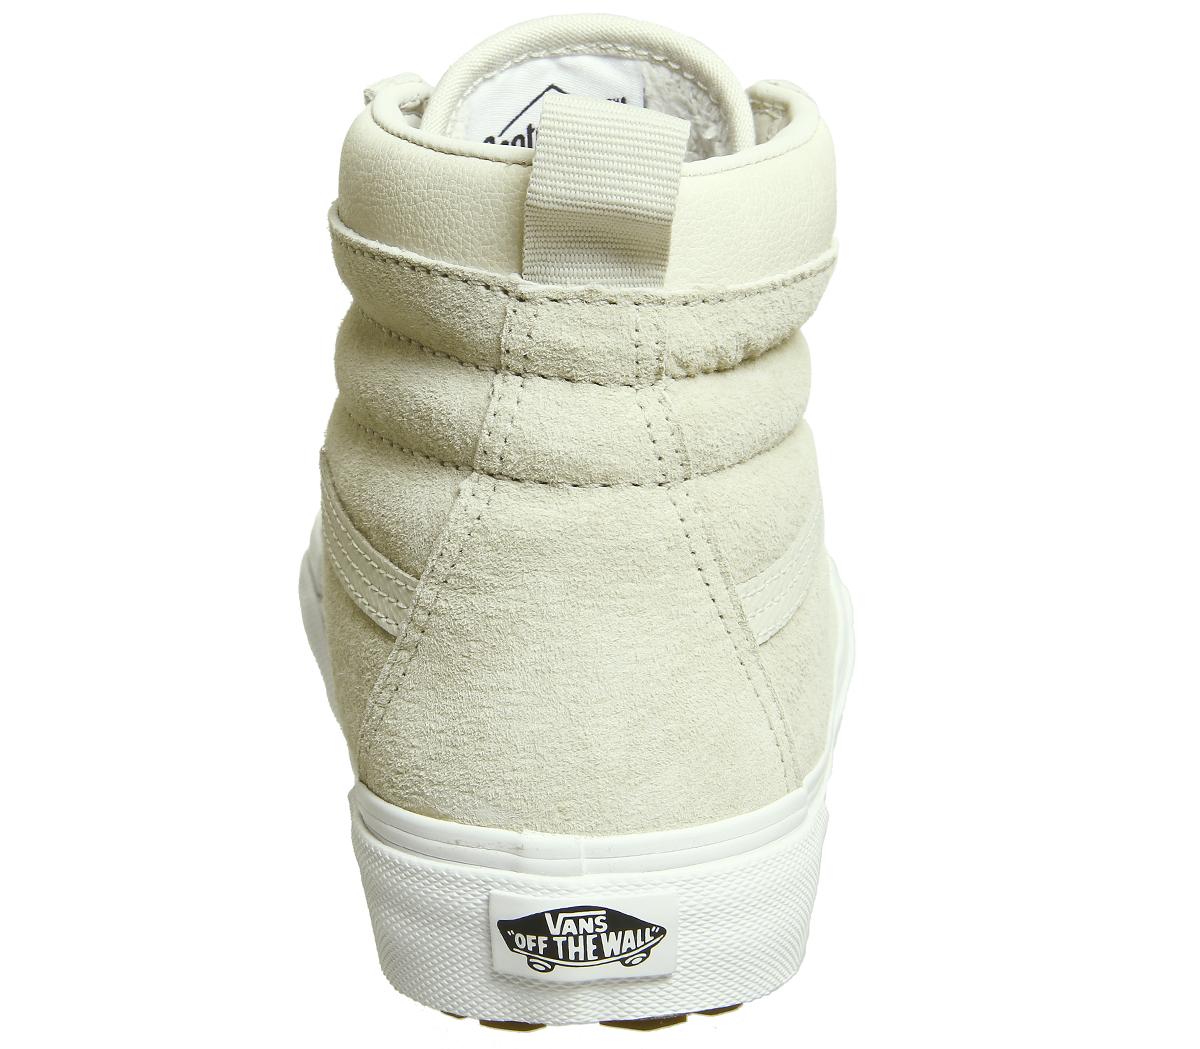 7d8f9f6ef8 Sentinel Womens Vans Sk8 Hi Mte Cement Birch Trainers Shoes